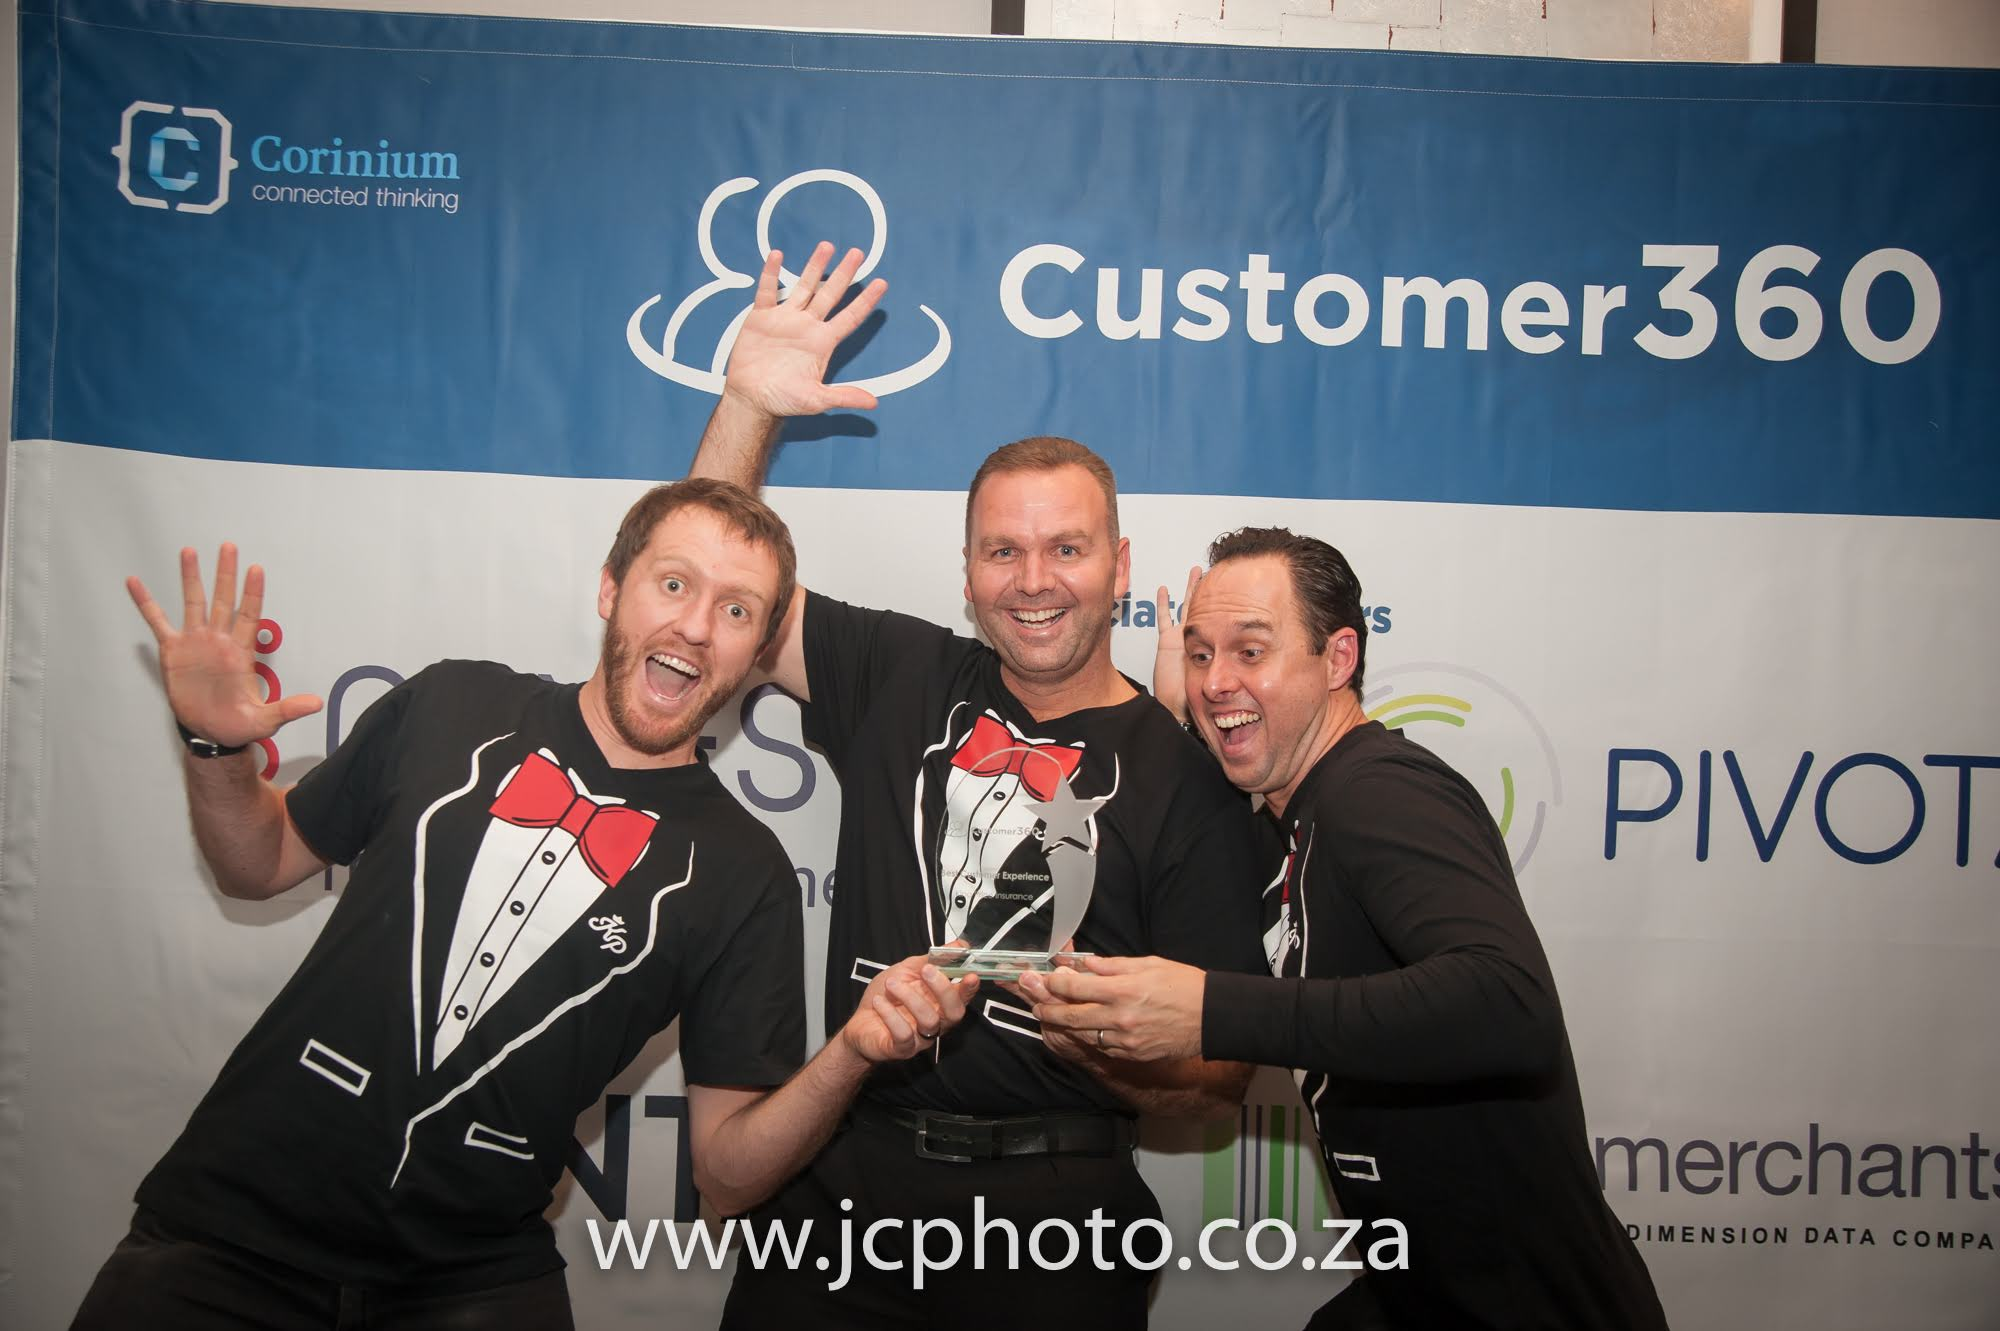 c360 awards